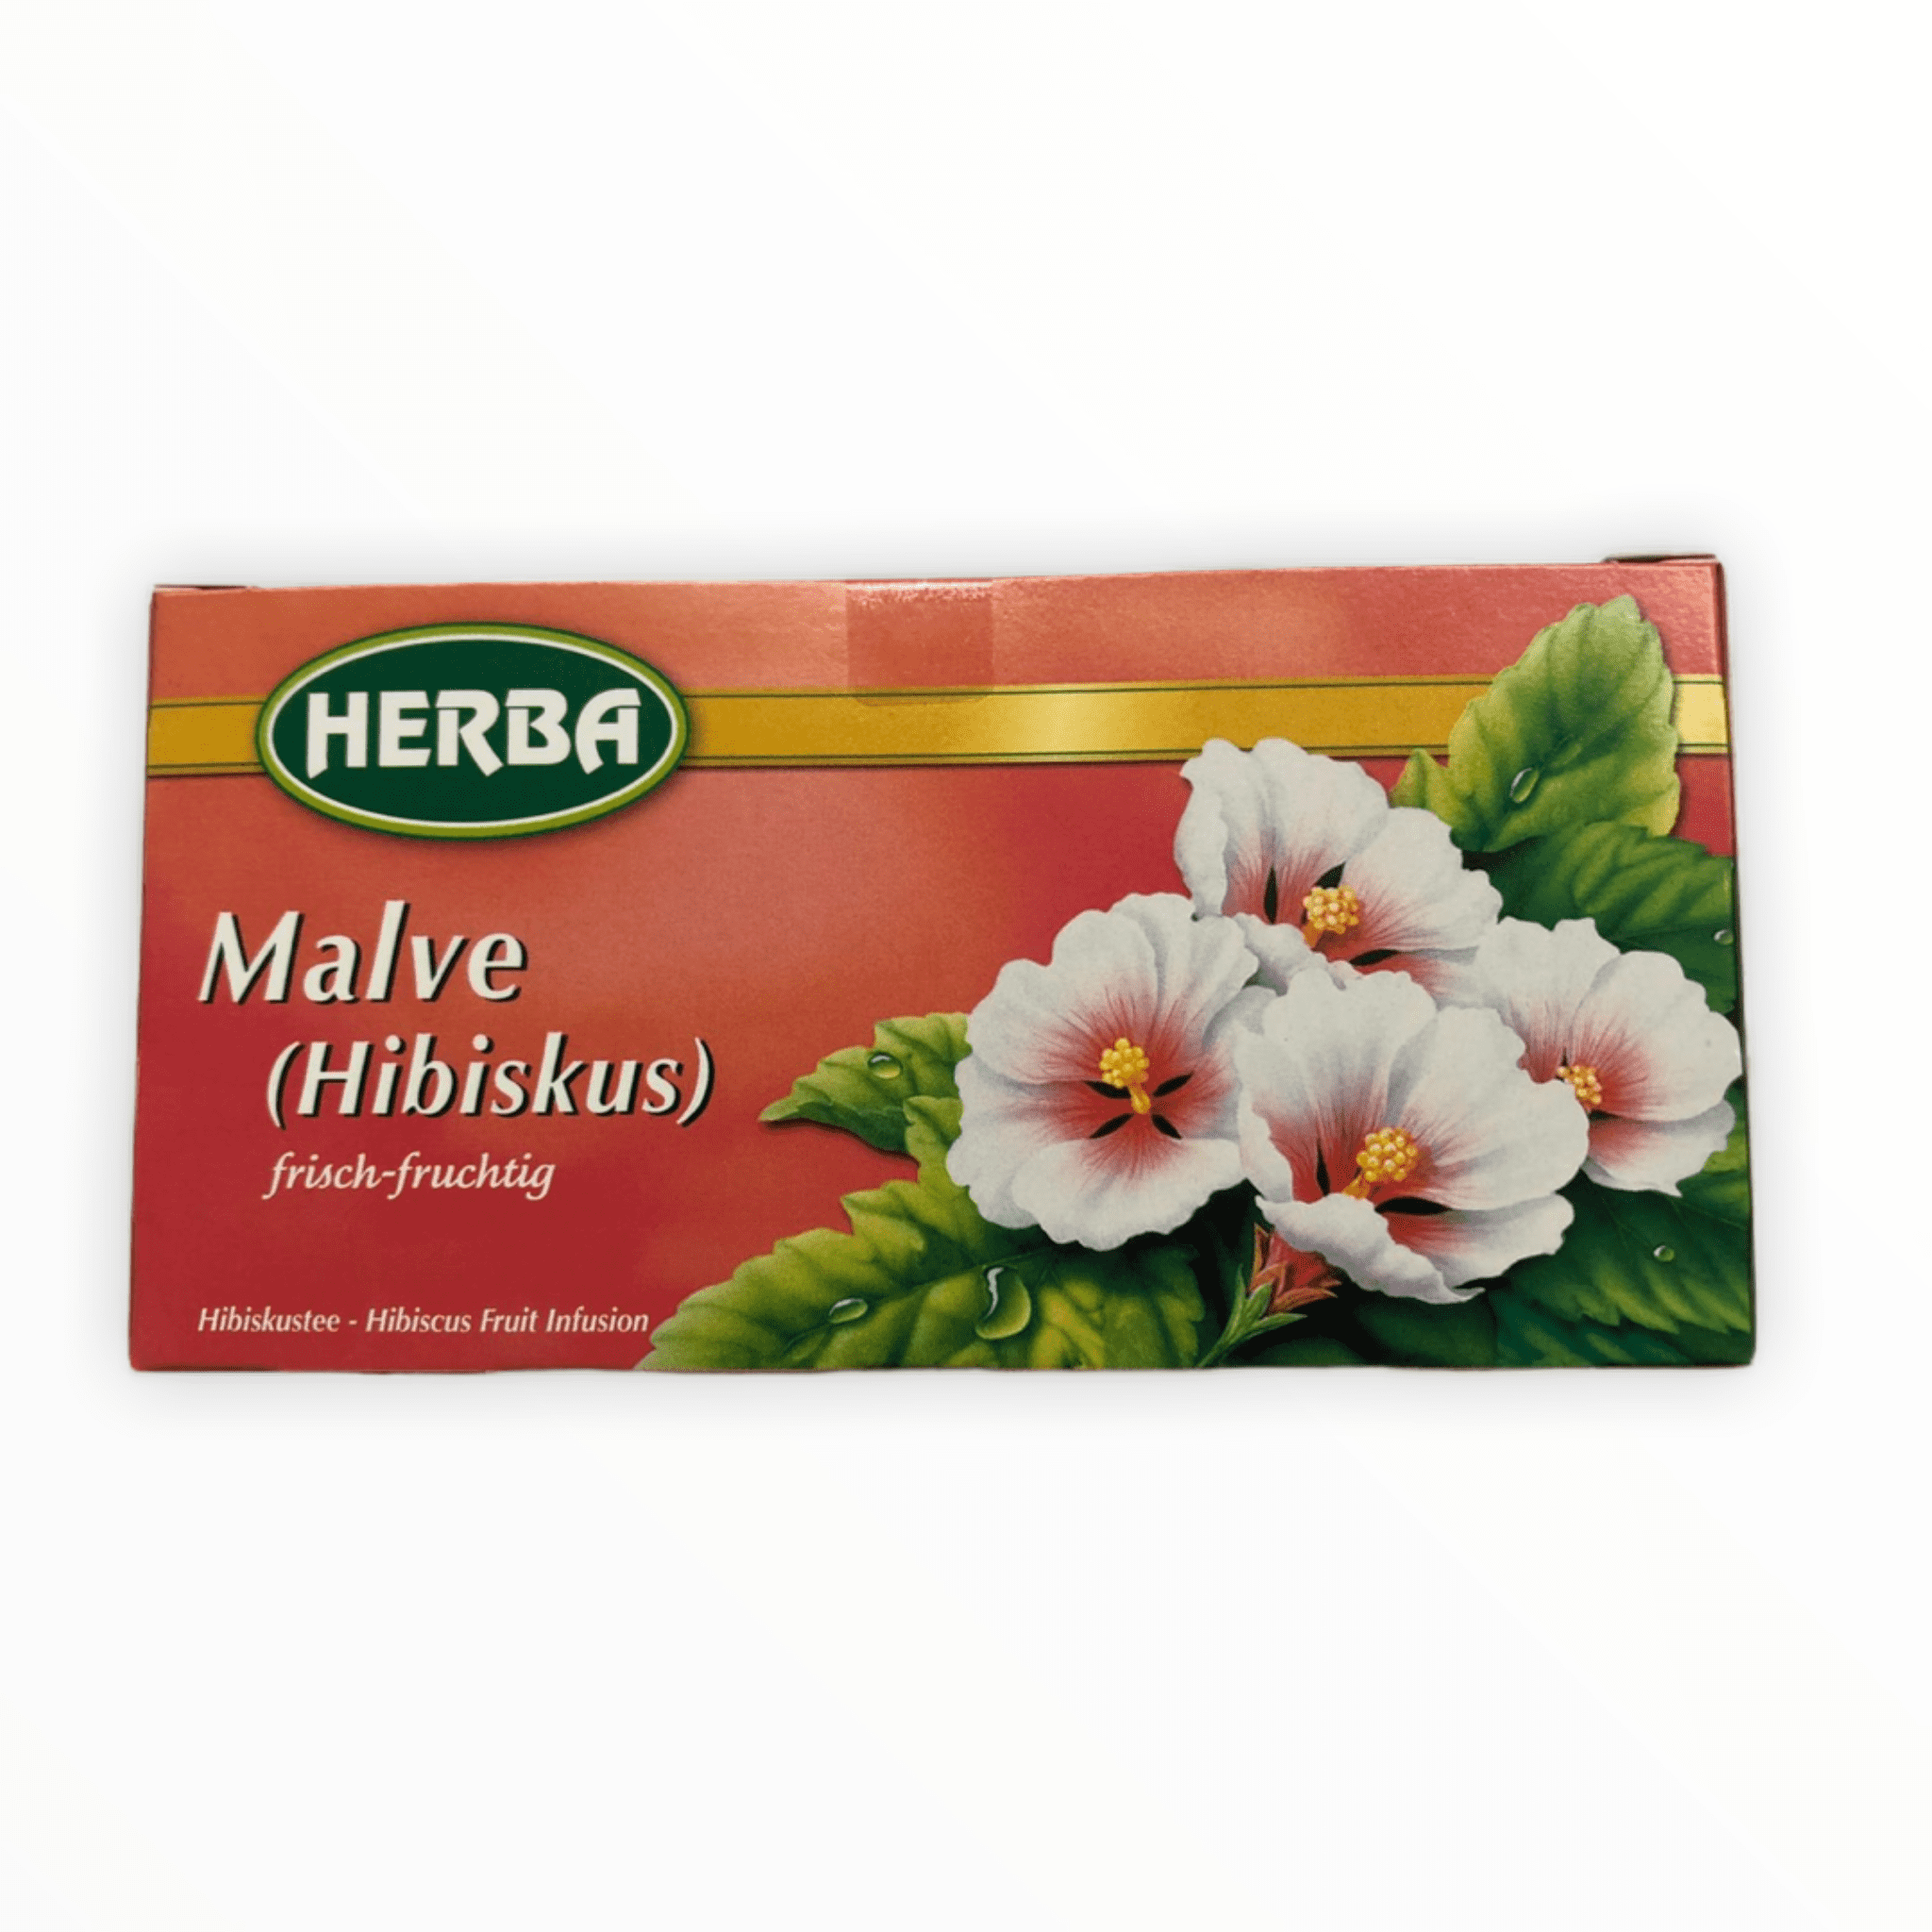 20er Packung Herba Tee Malve 30g